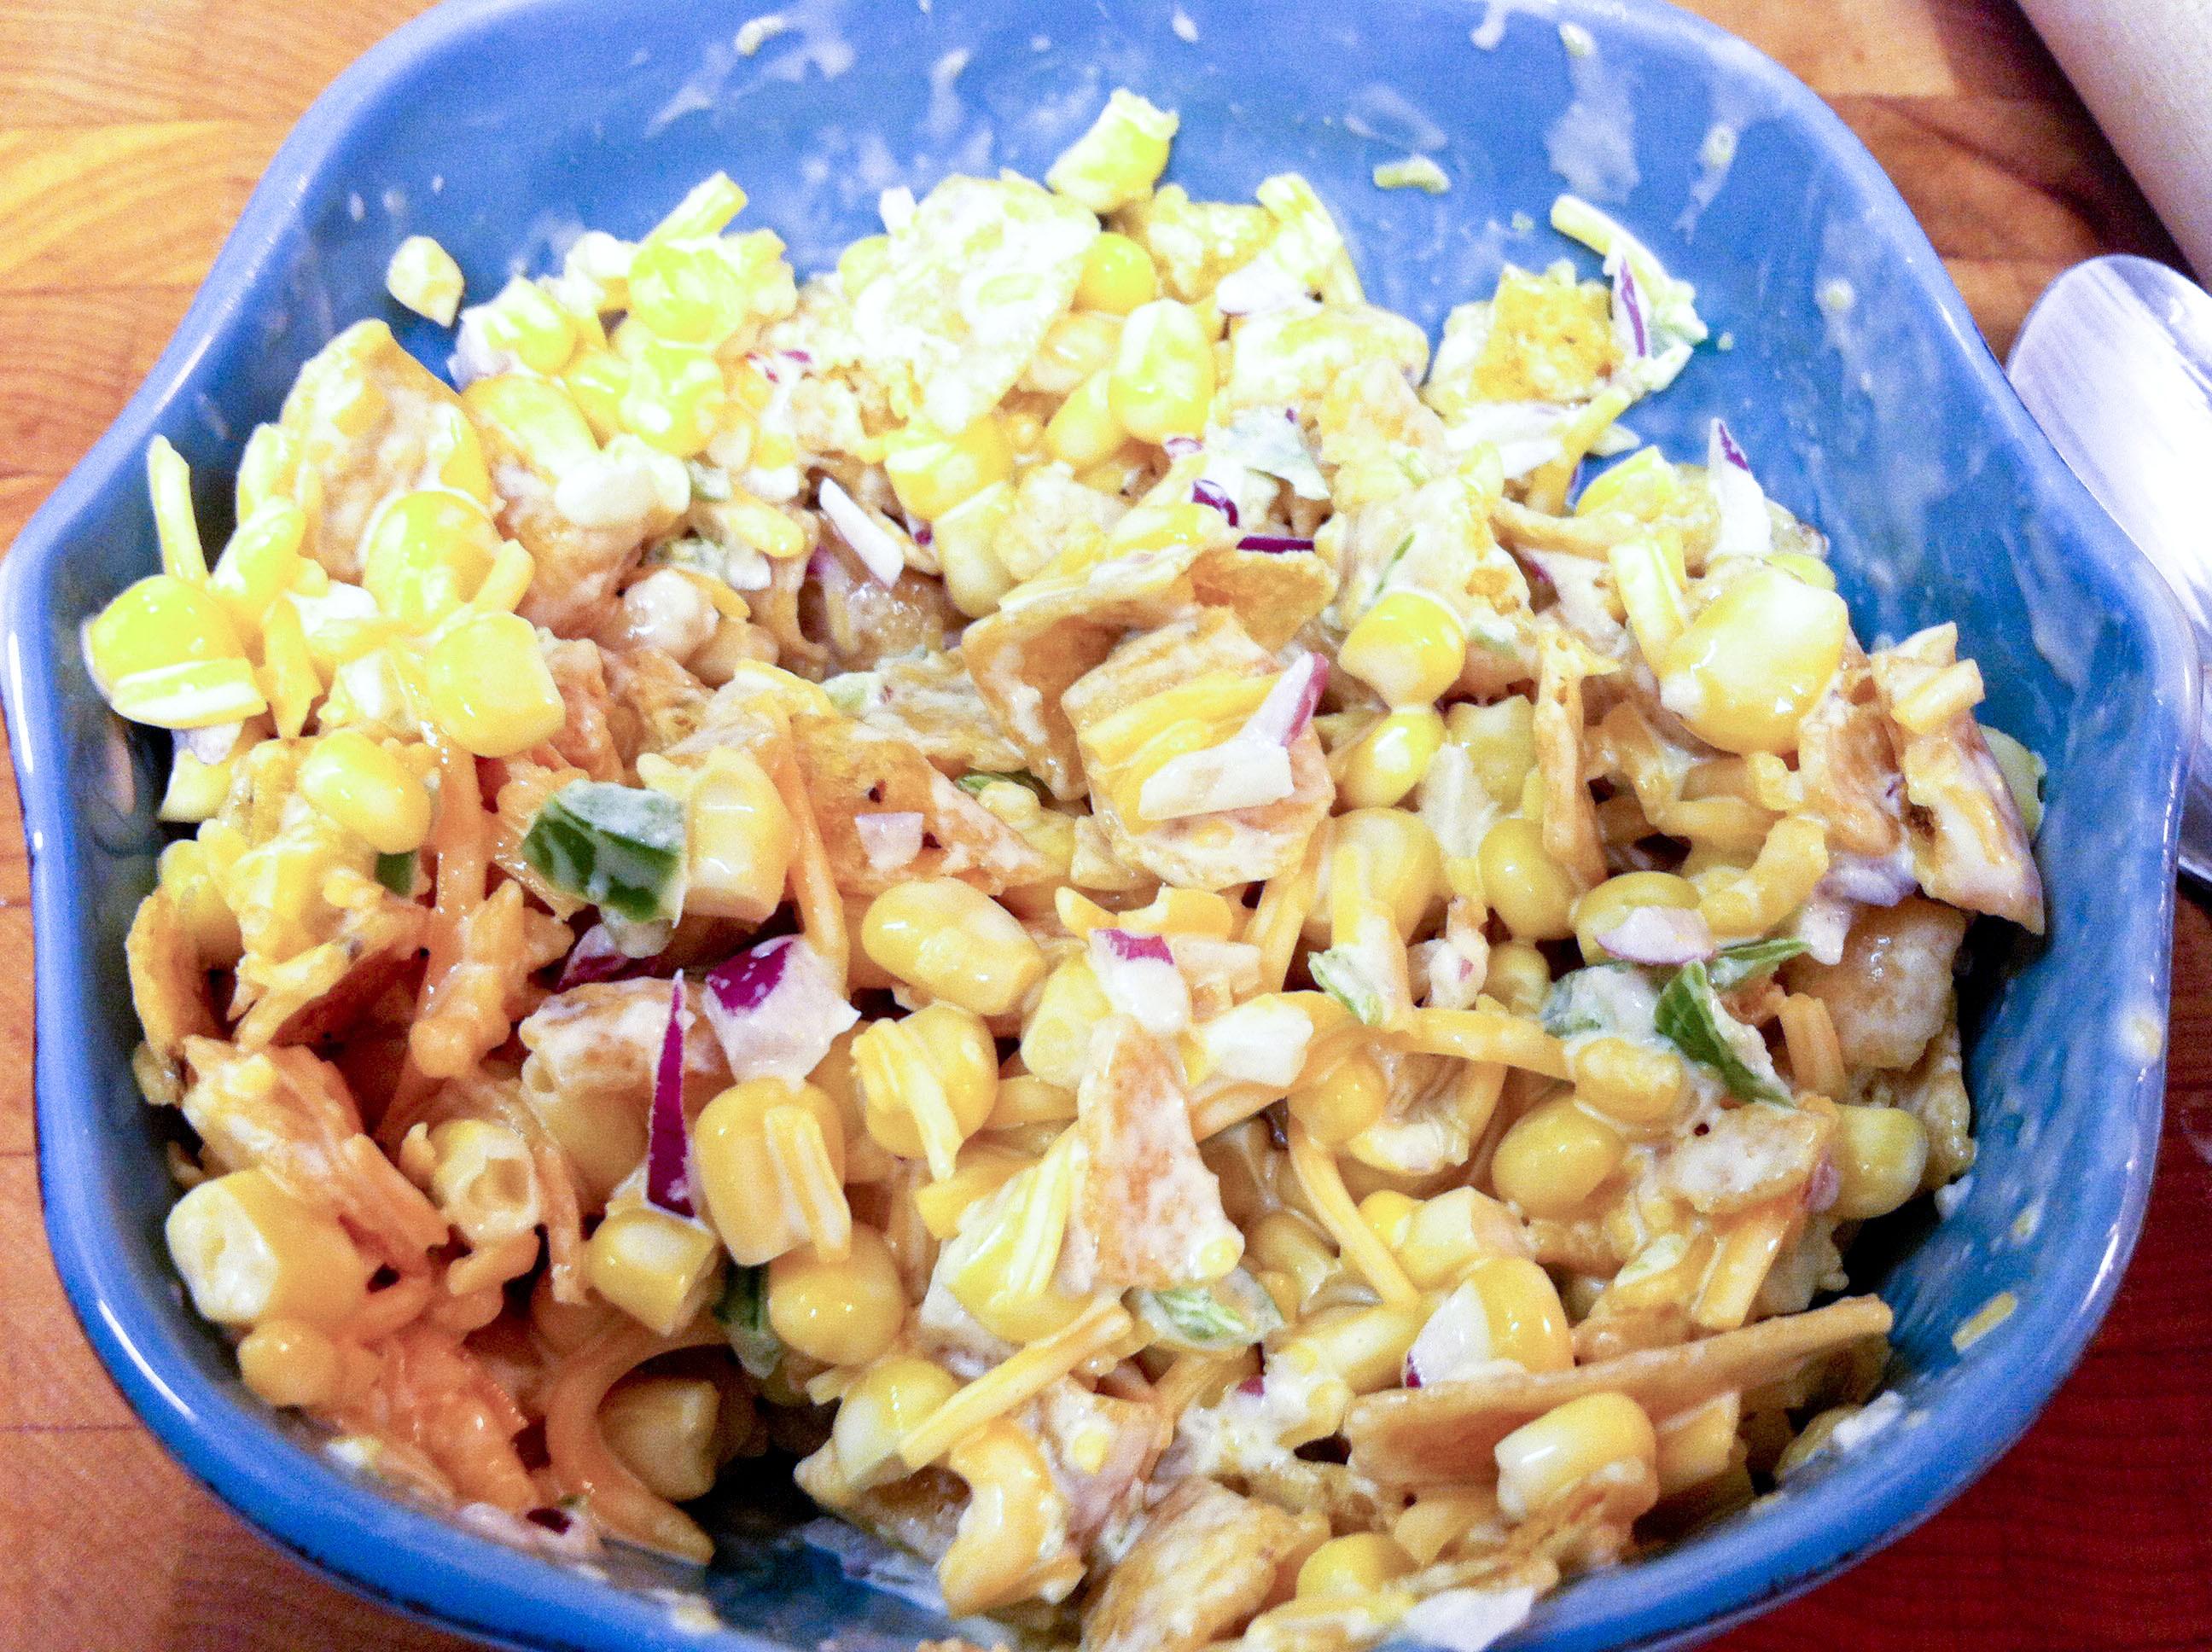 Paula Deen Corn Salad  paula deen chili cheese frito corn salad